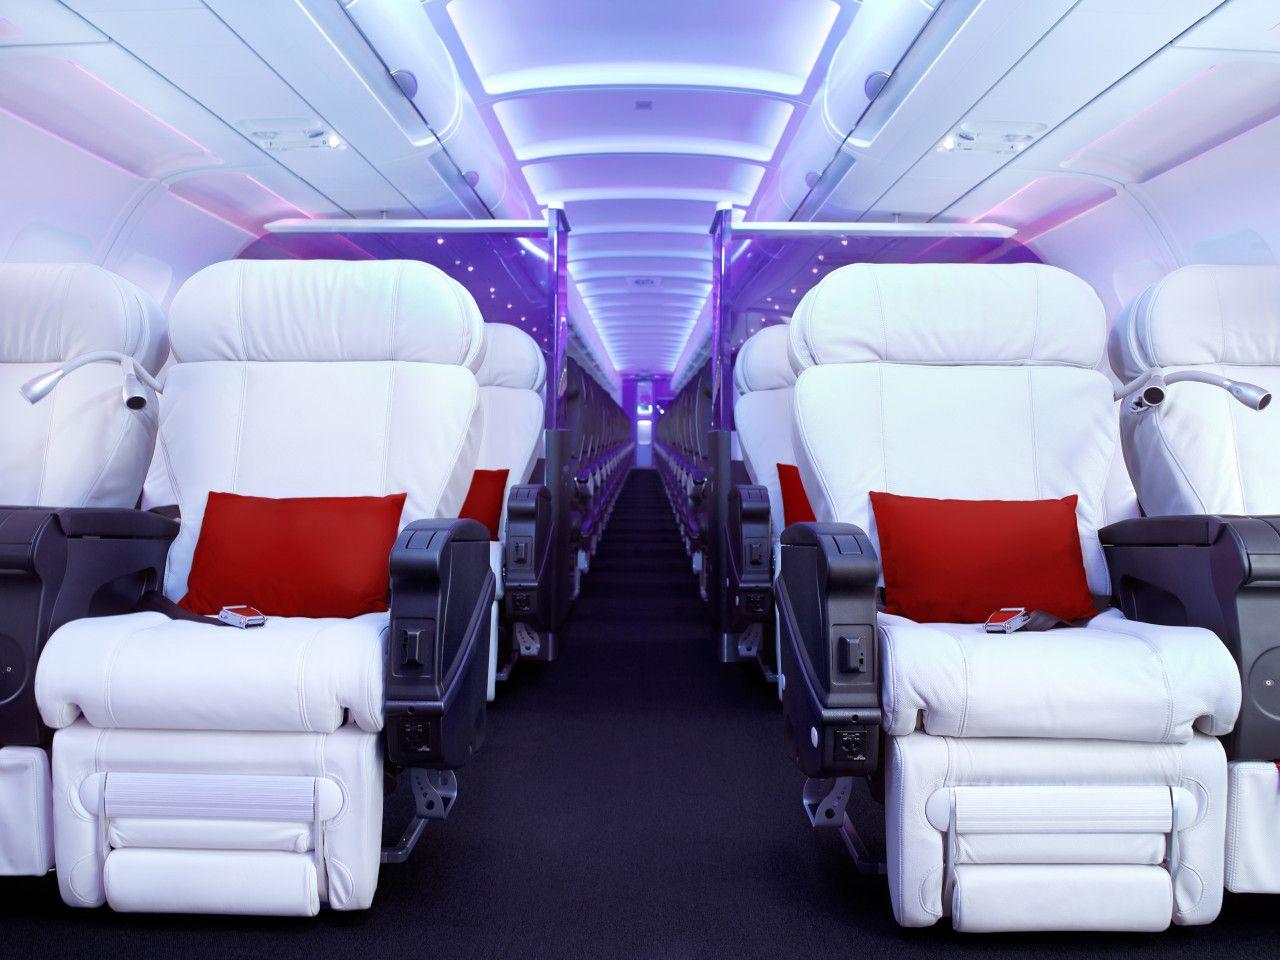 virgin airlines business class Google Search Virgin